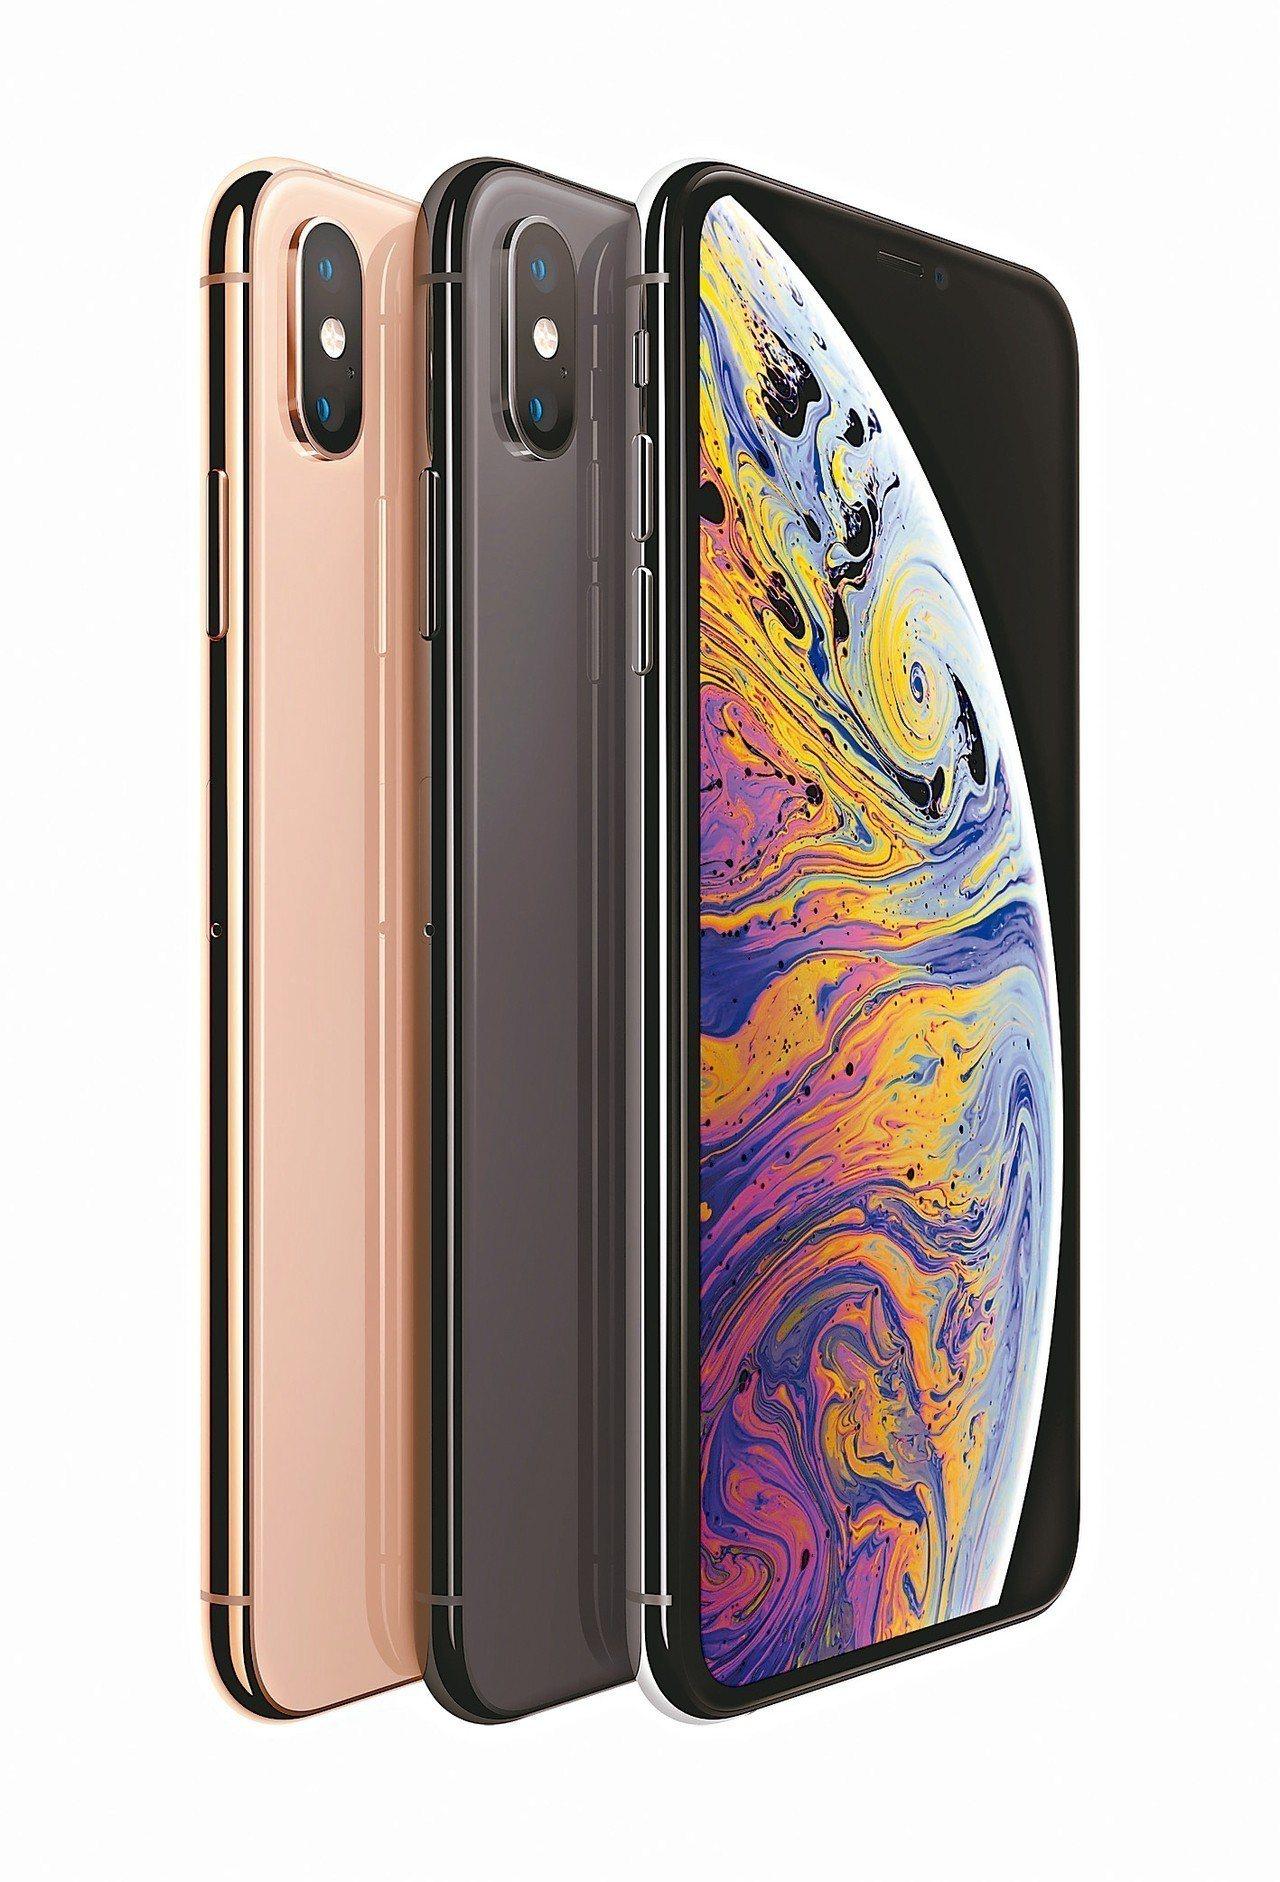 iPhone XS、iPhone XS Max共推出金、銀、太空灰3色。 圖/摘...